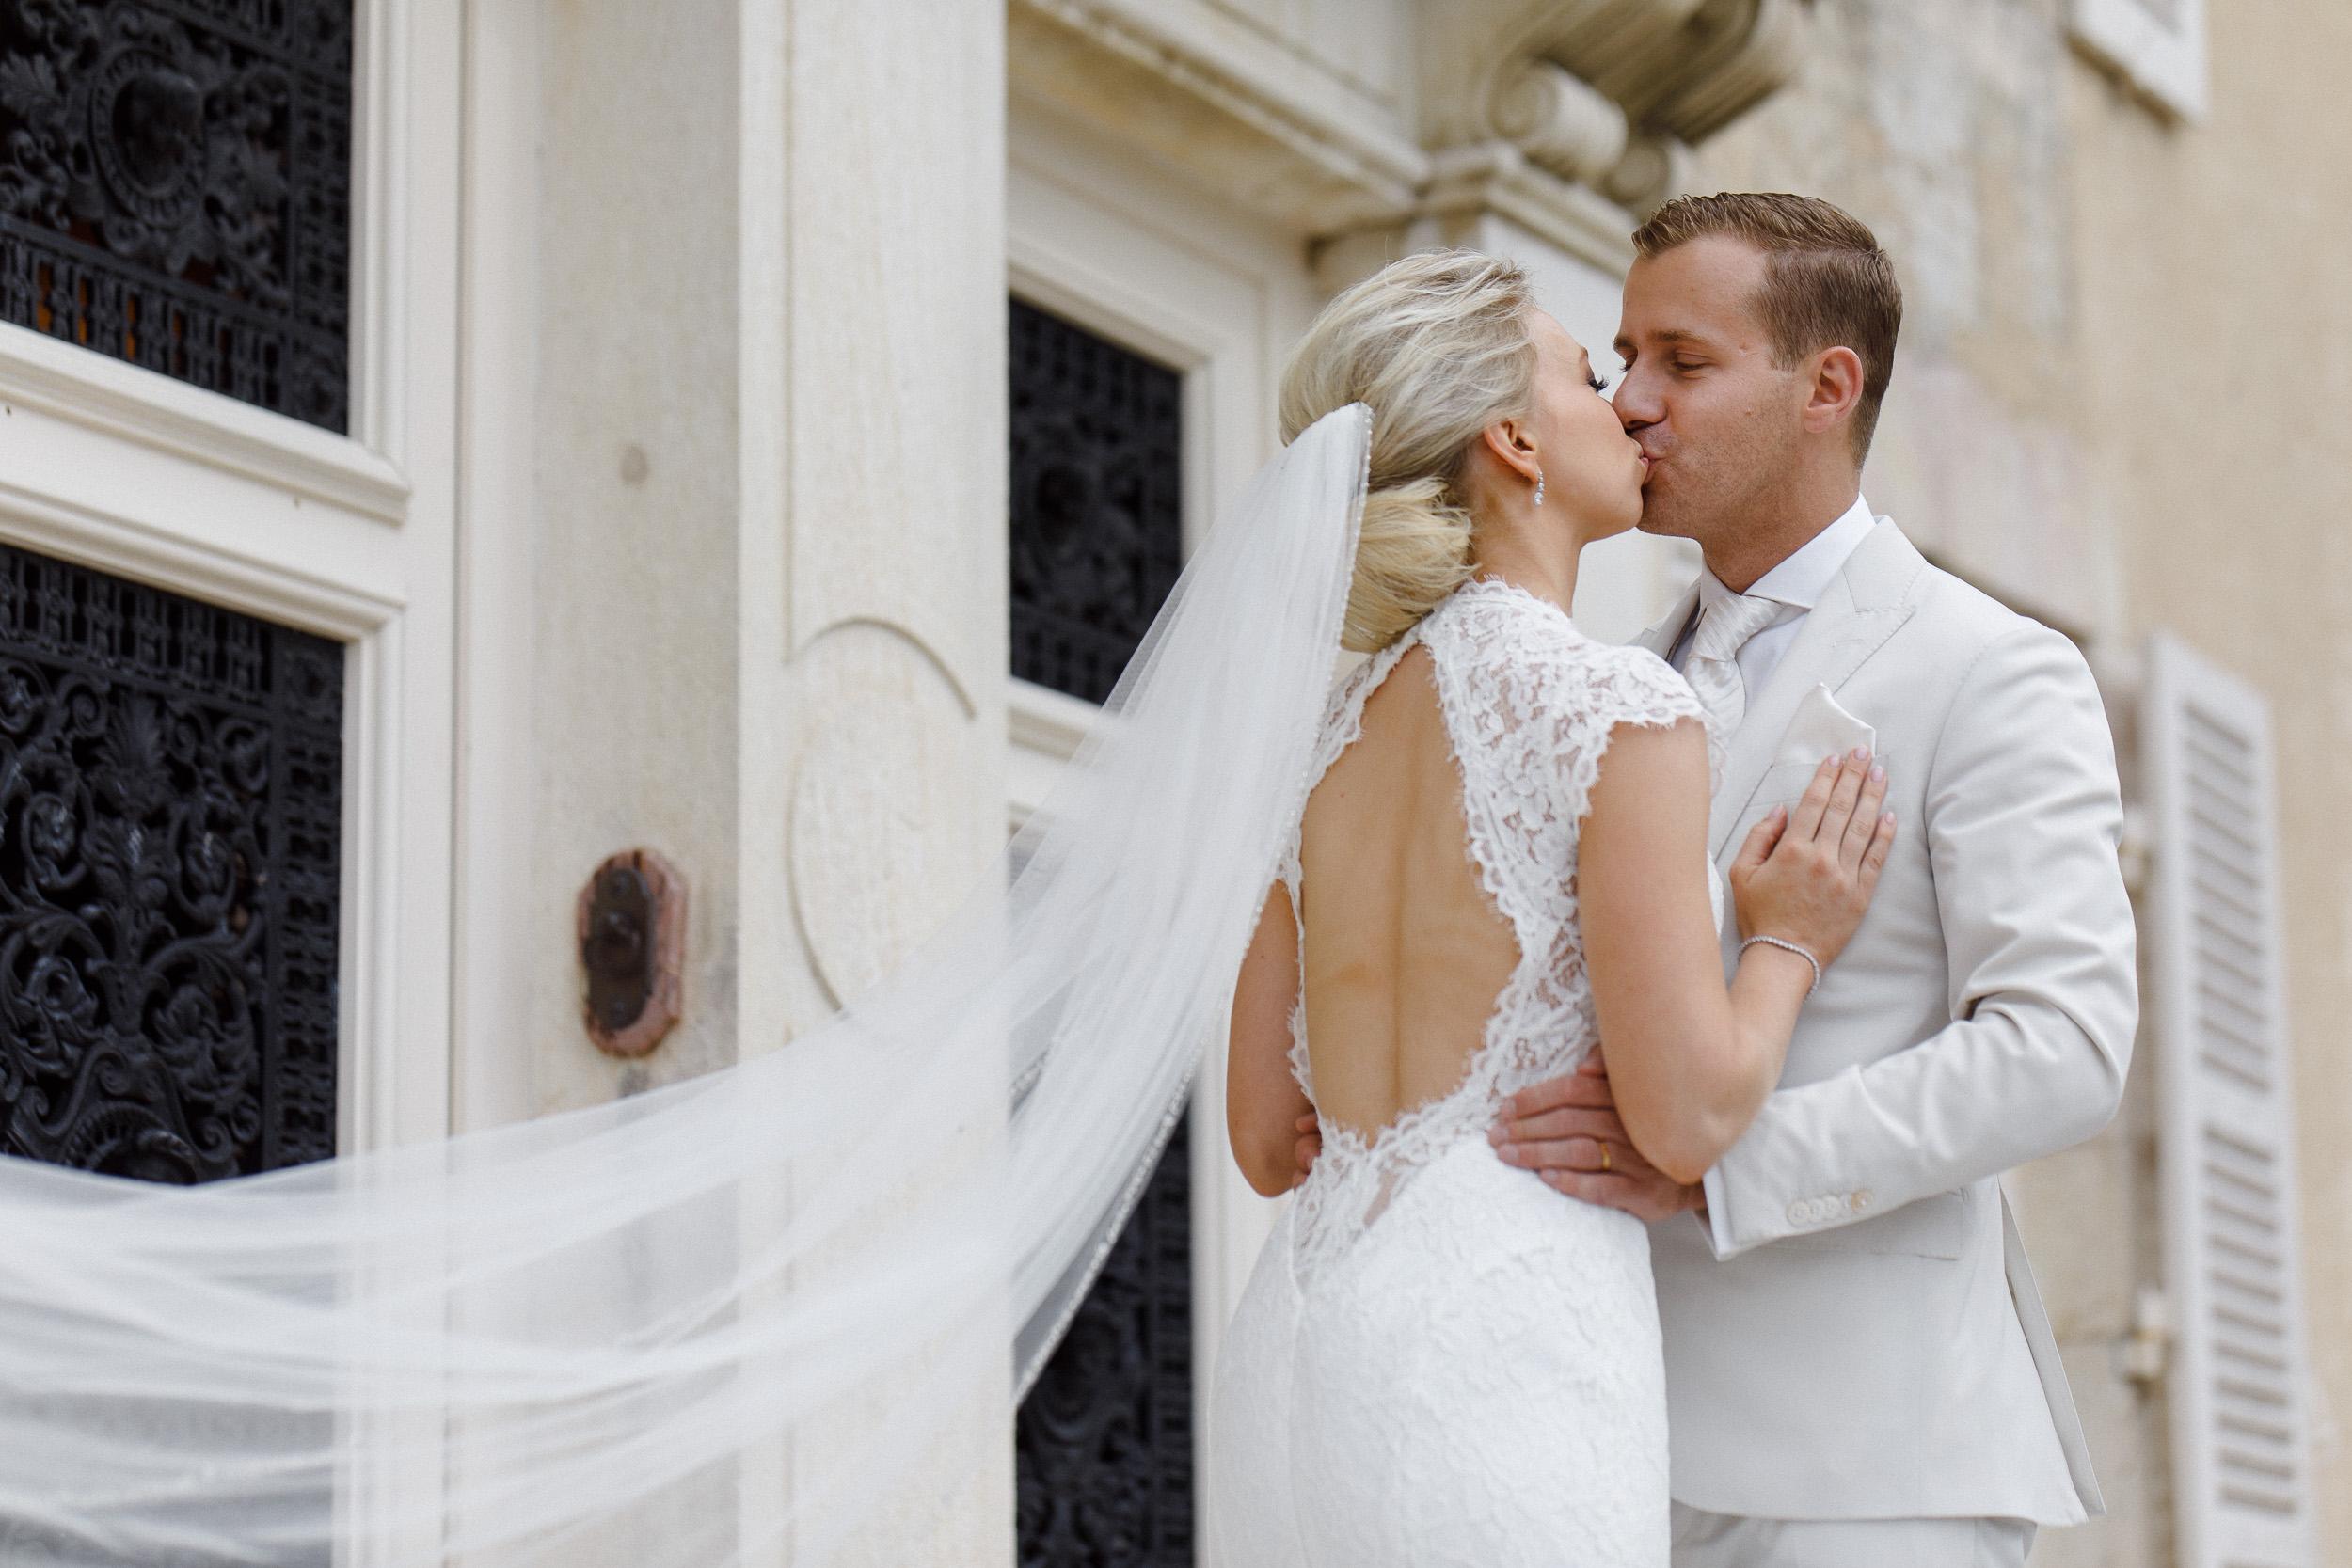 Wedding-Chateau-de-Varennes-069.jpg